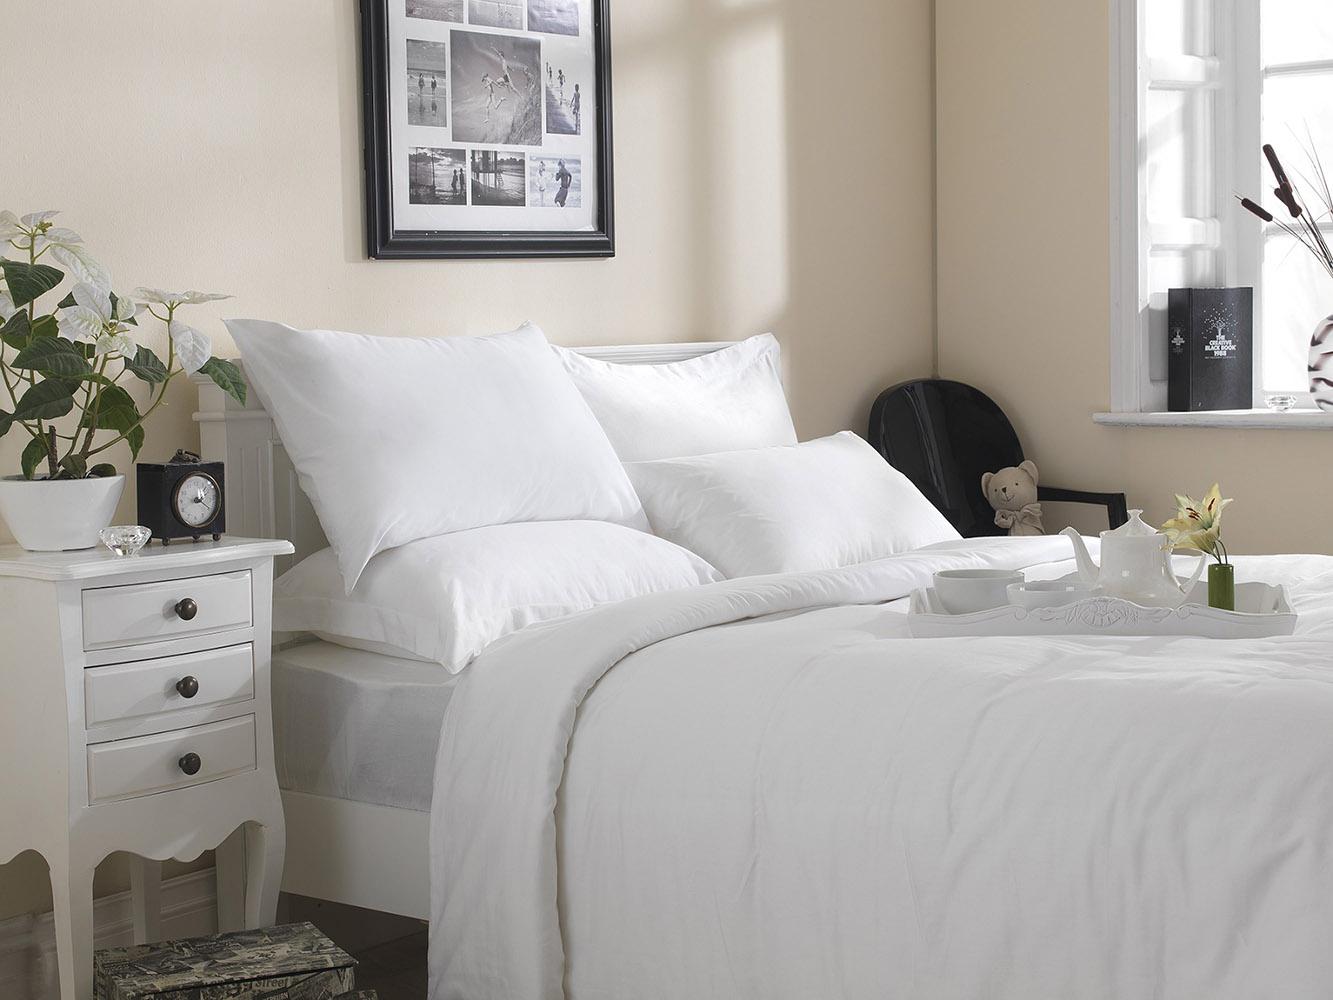 Premium White Linen Range - 20 or 30 Twill Pattern 100% Cotton Duvet Covers in White